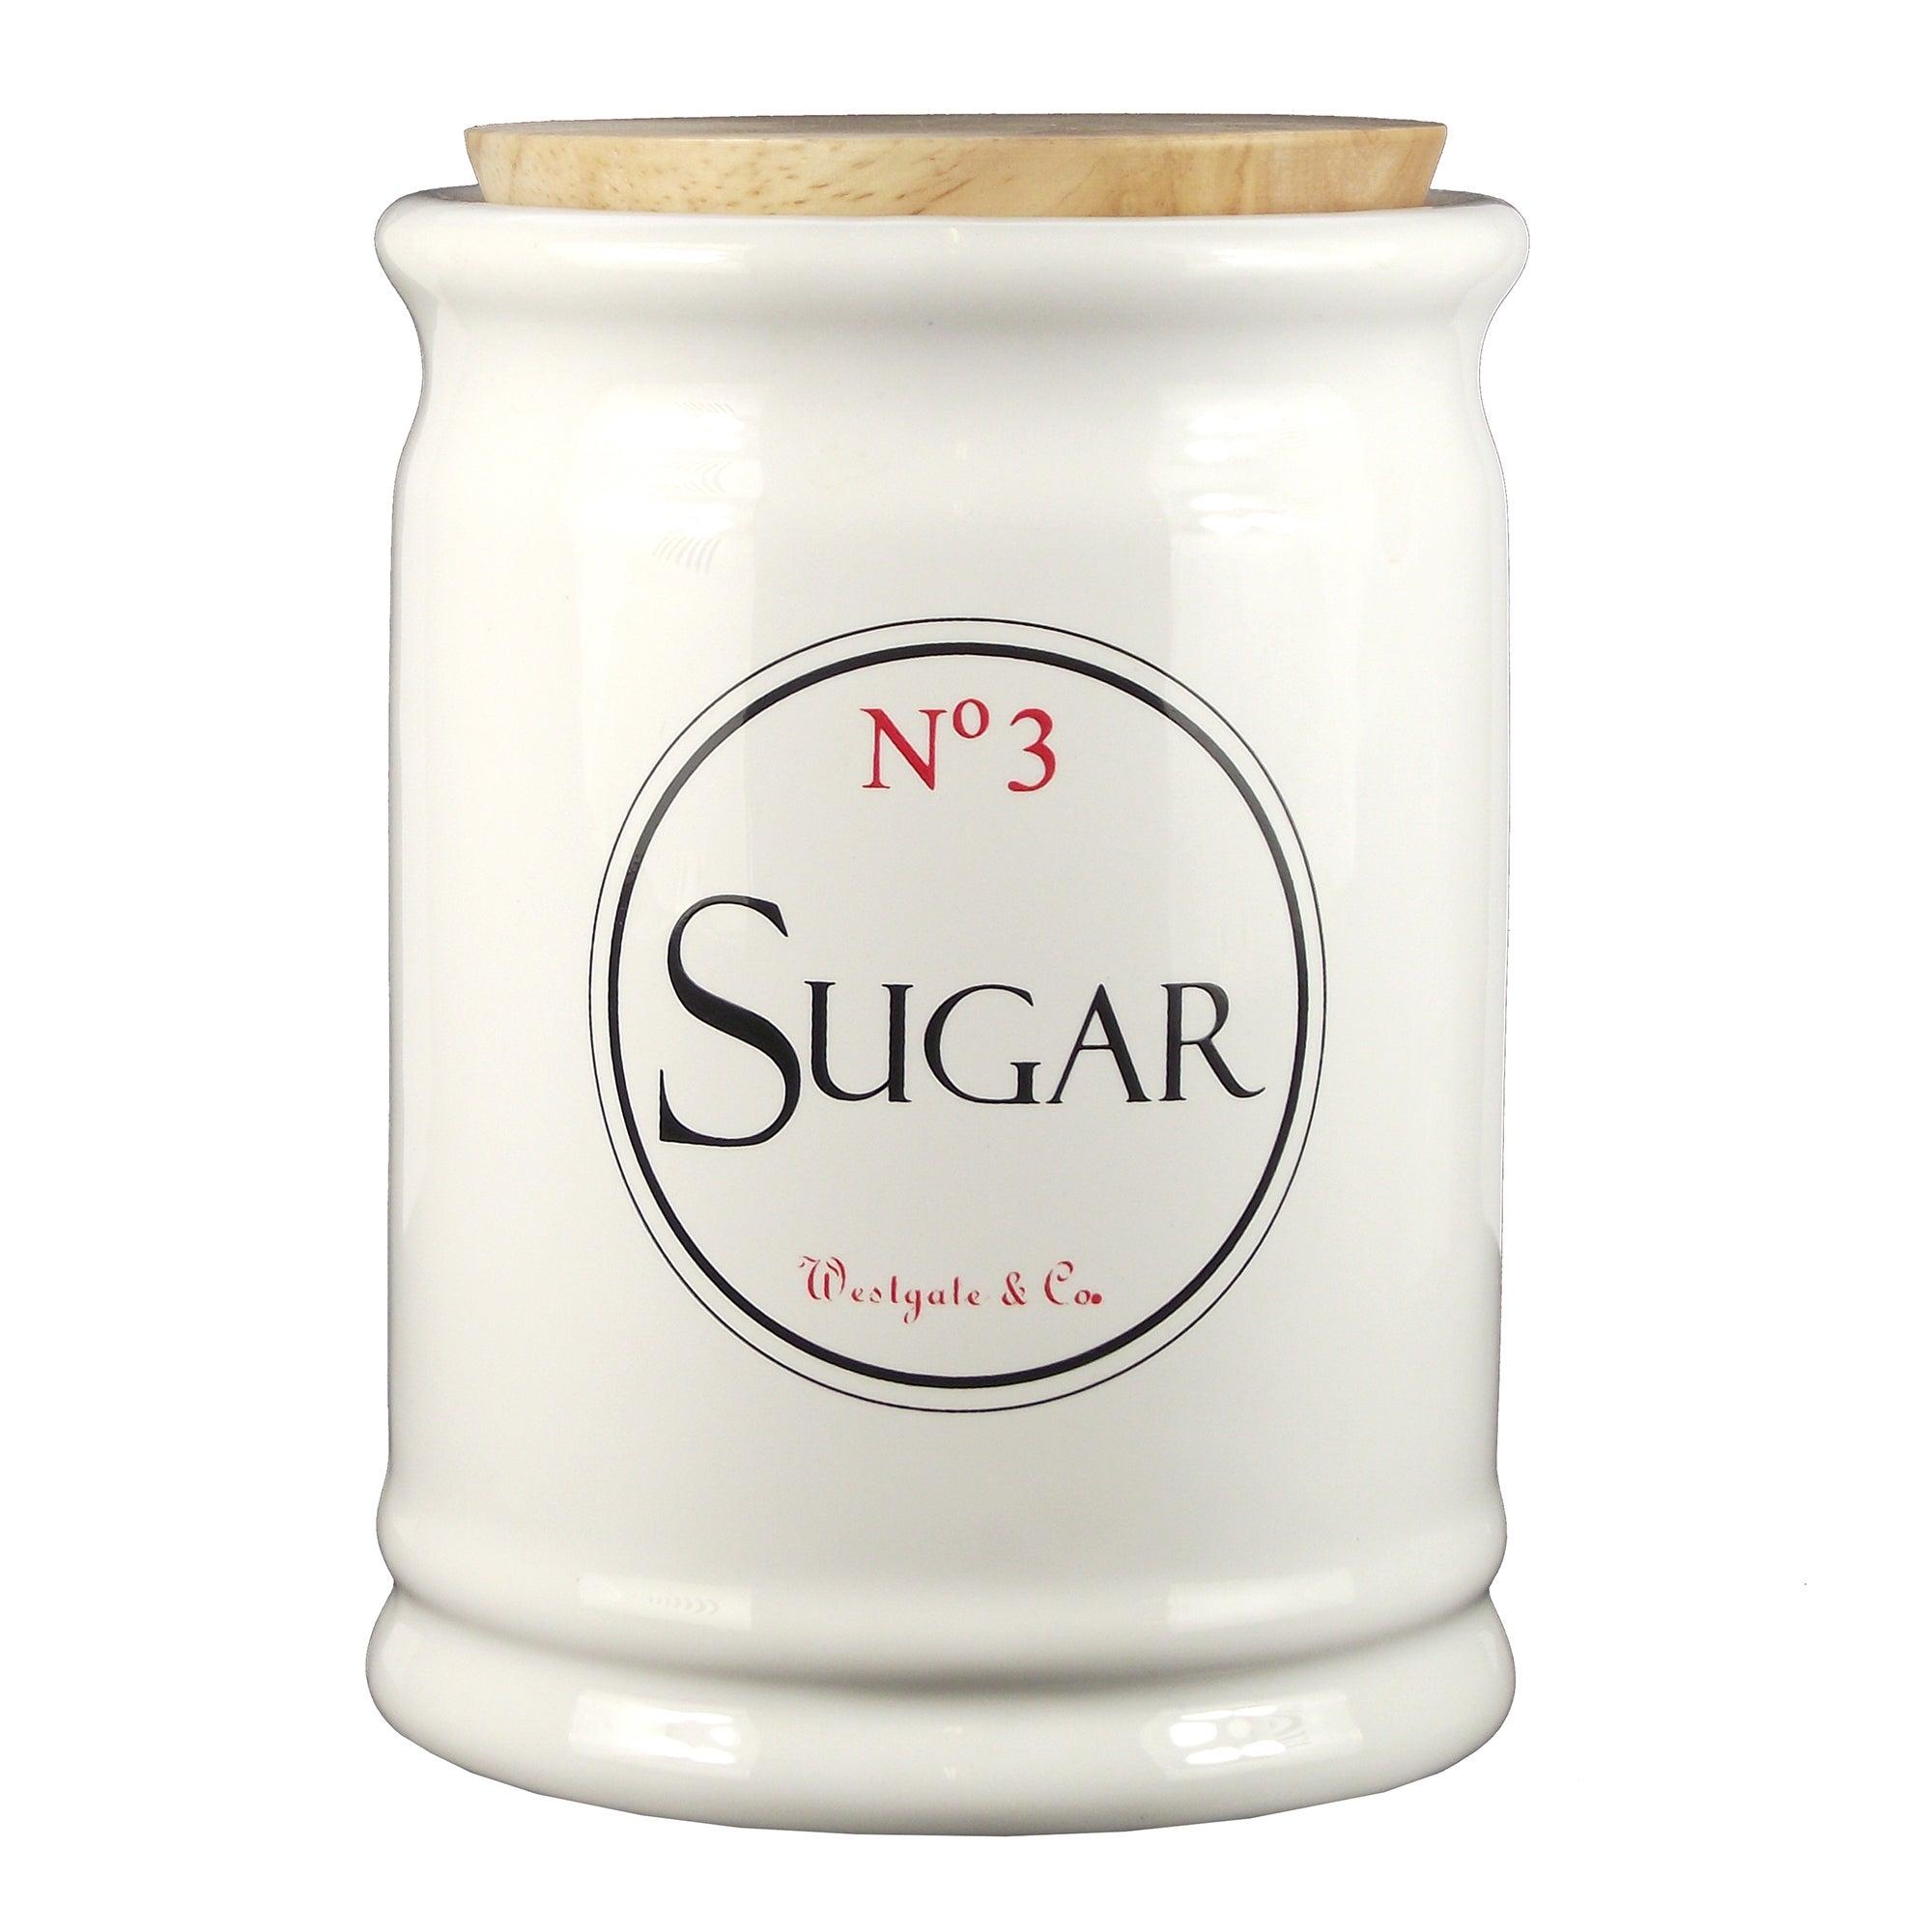 Vintage Tea Sign Collection Sugar Canister